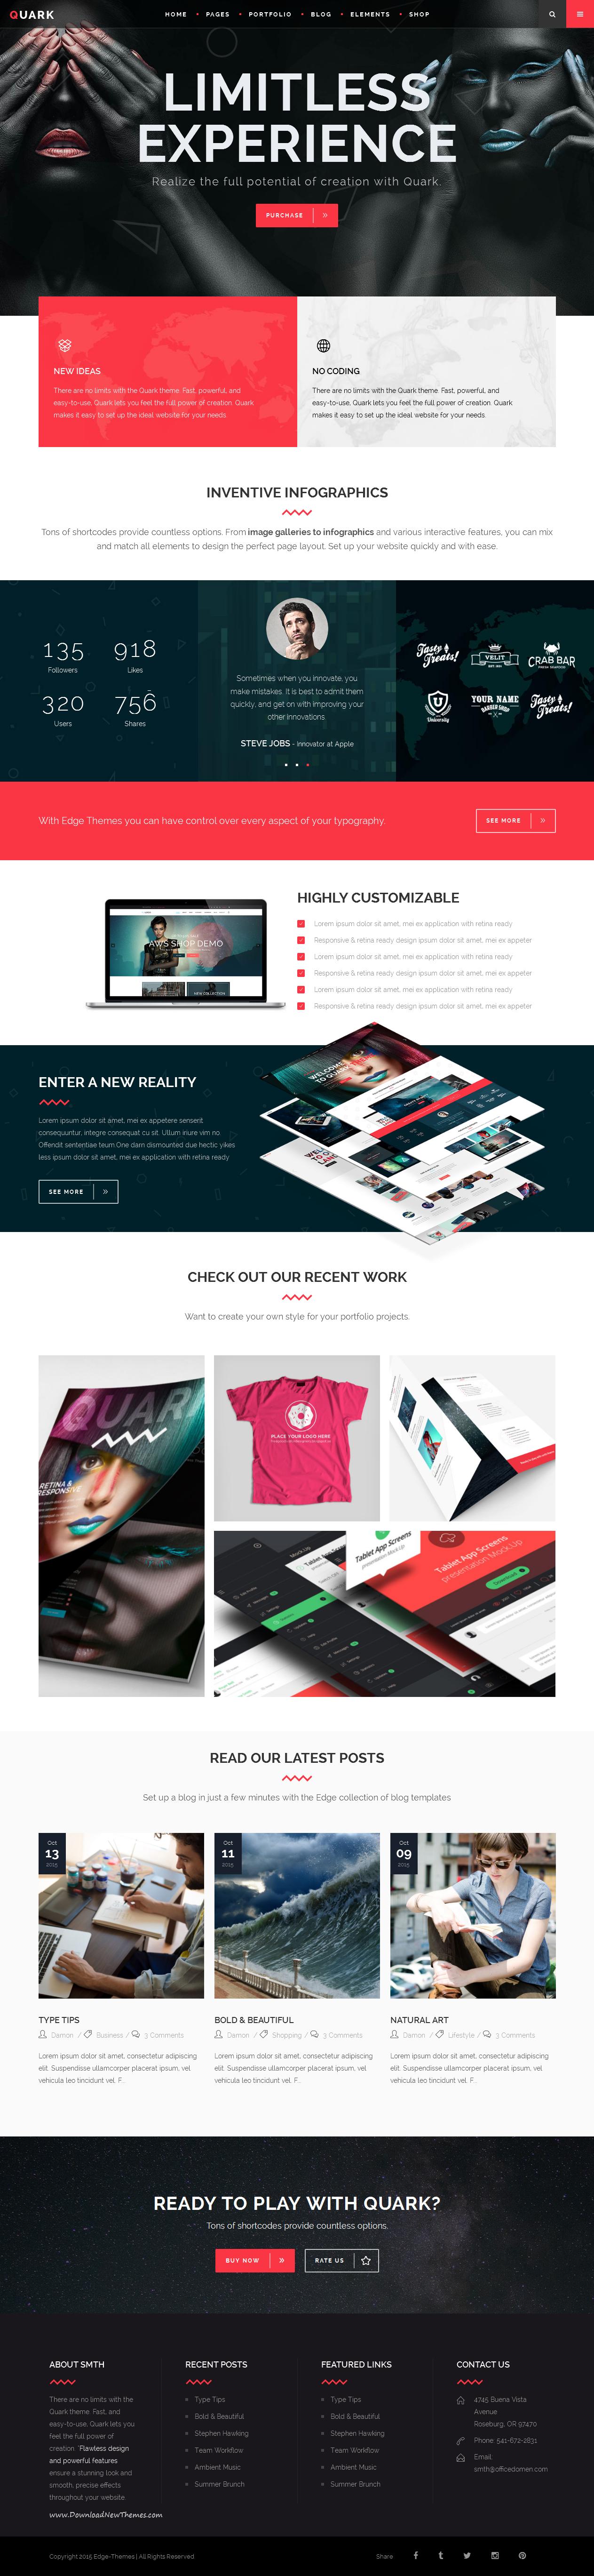 A modern WordPress Theme for Digital Art #Studio #Website.